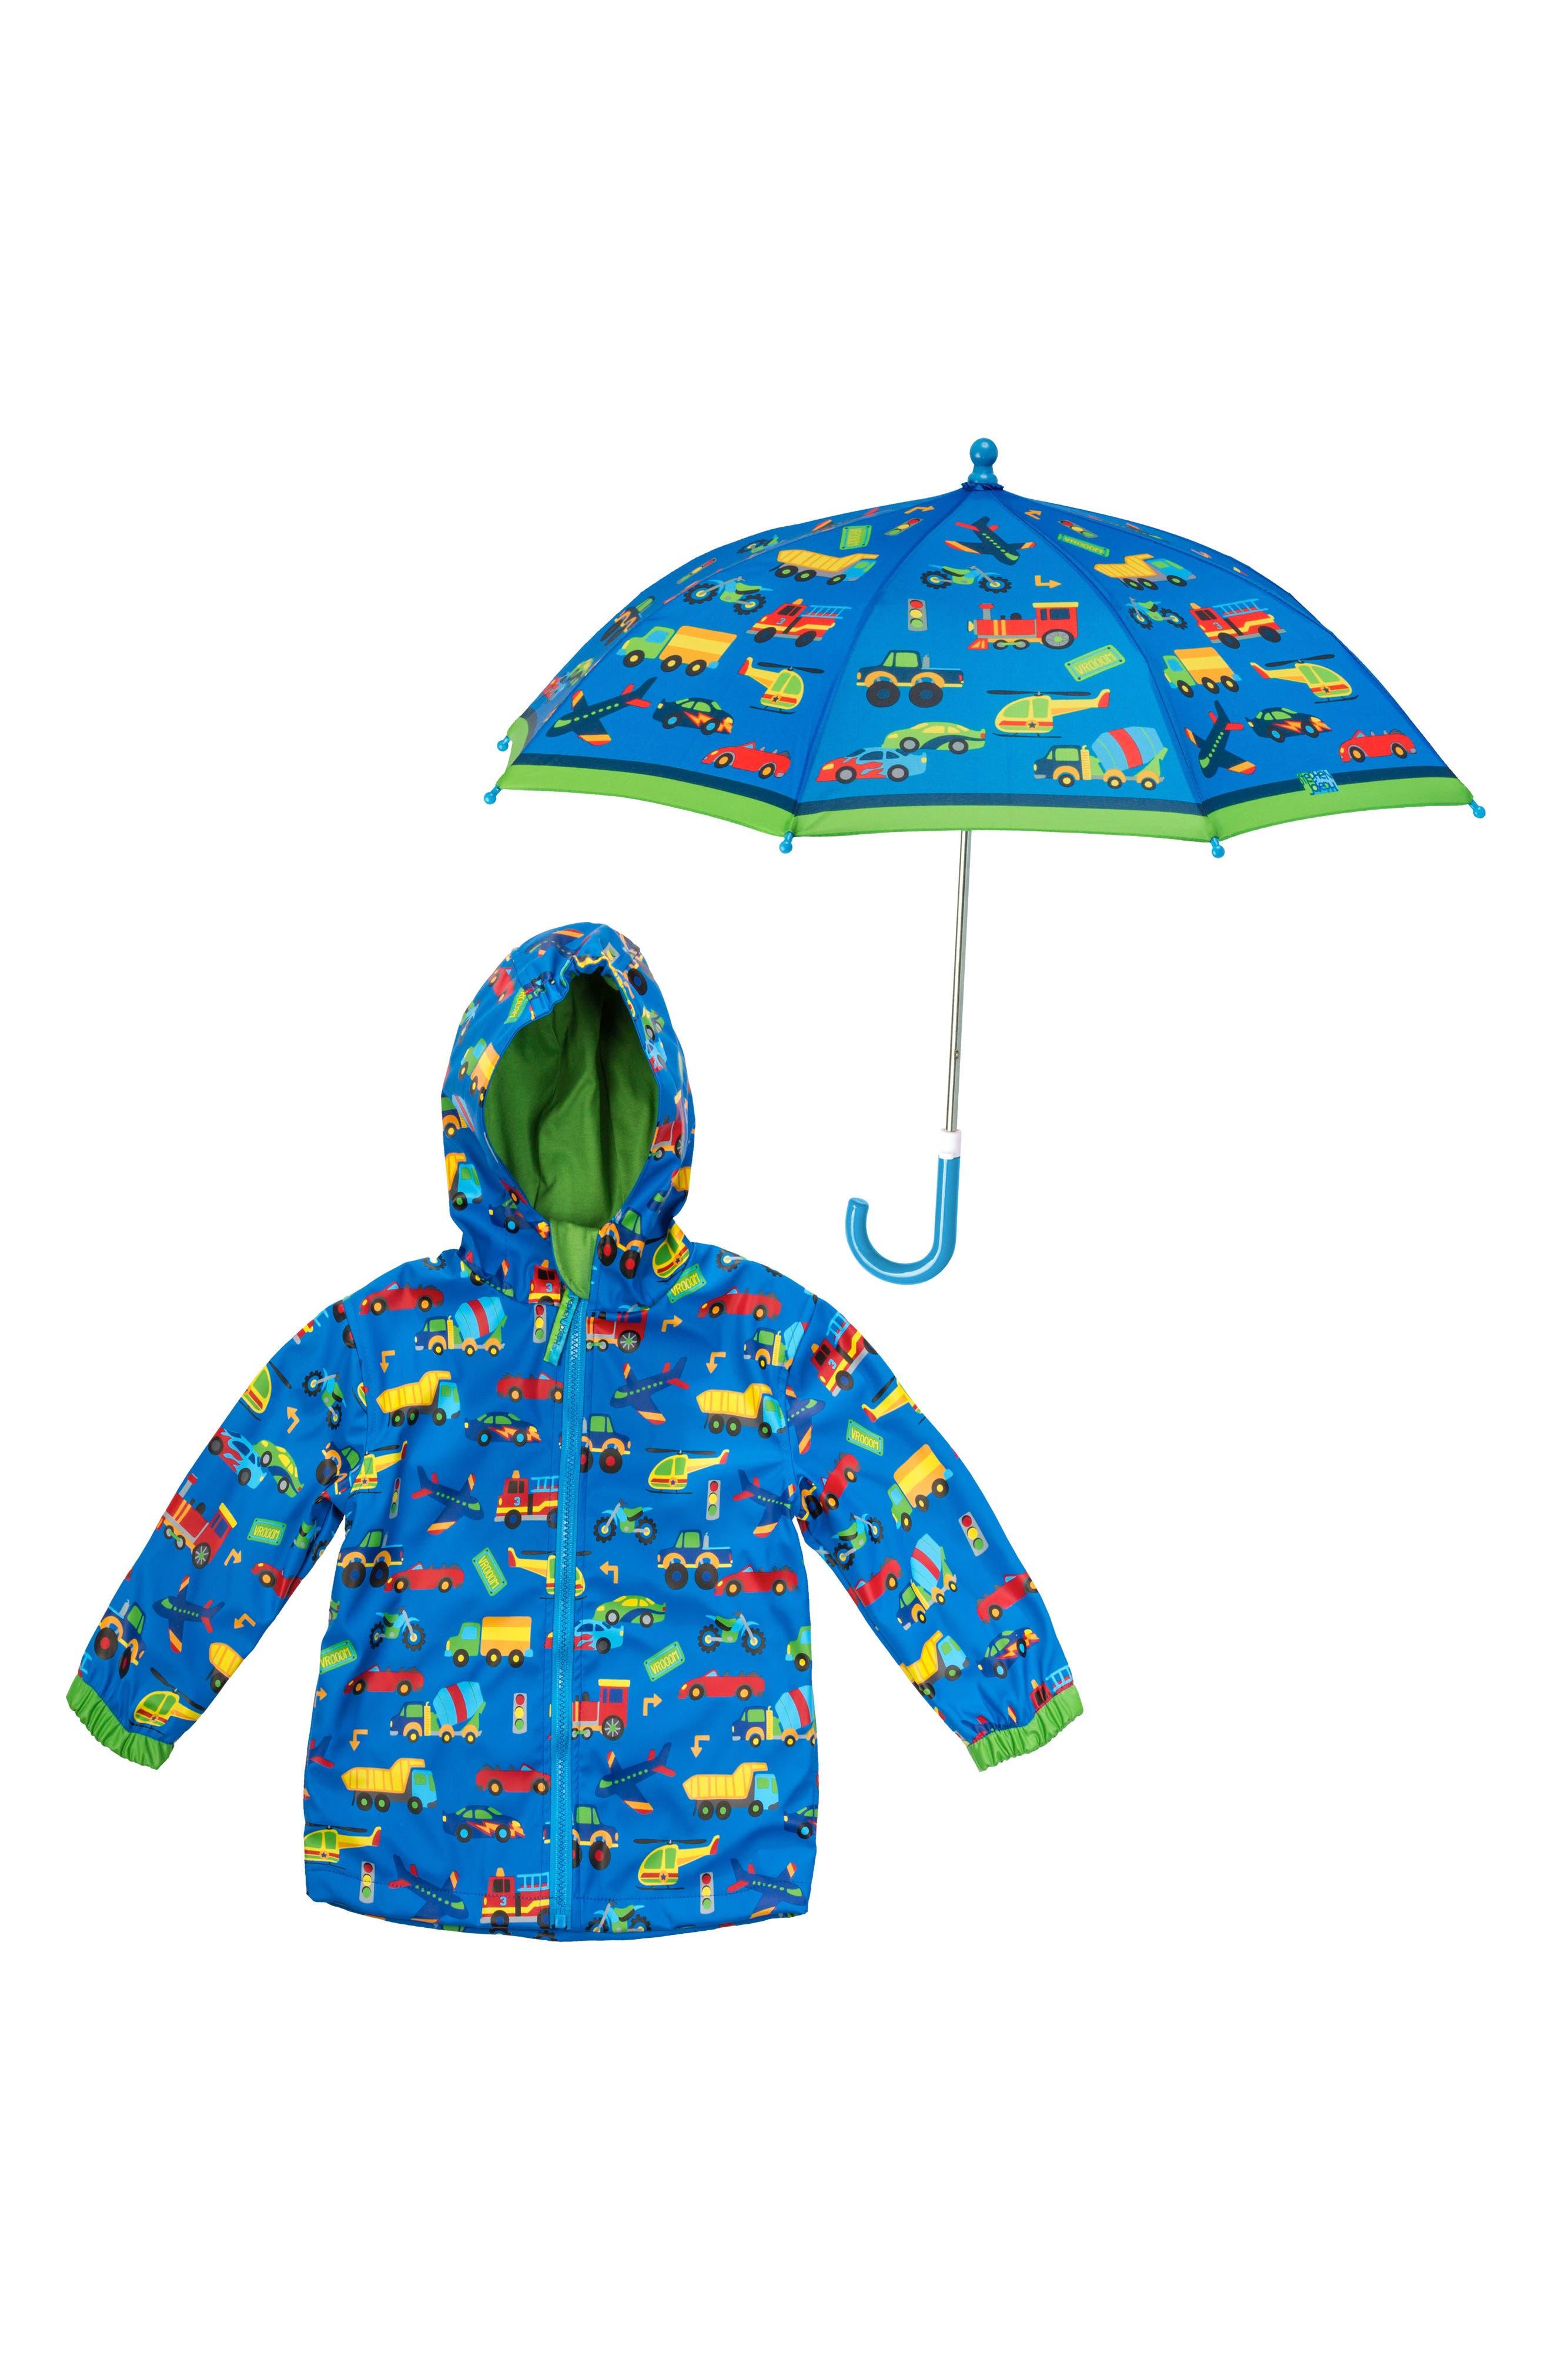 Toddler Boys Stephen Joseph Raincoat  Umbrella Set